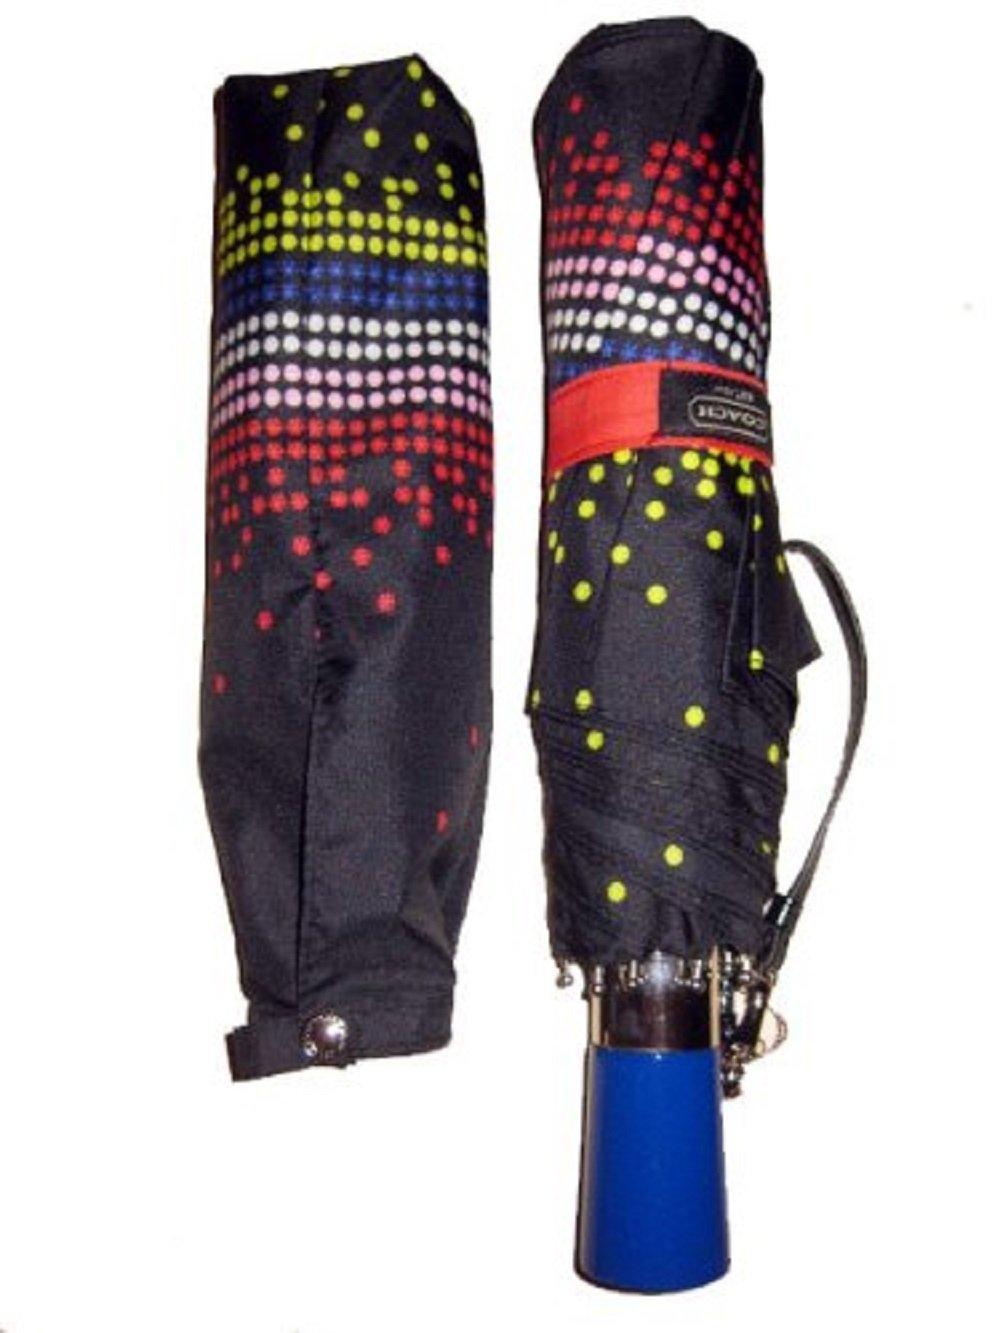 Coach Rhinestone Compact Umbrella